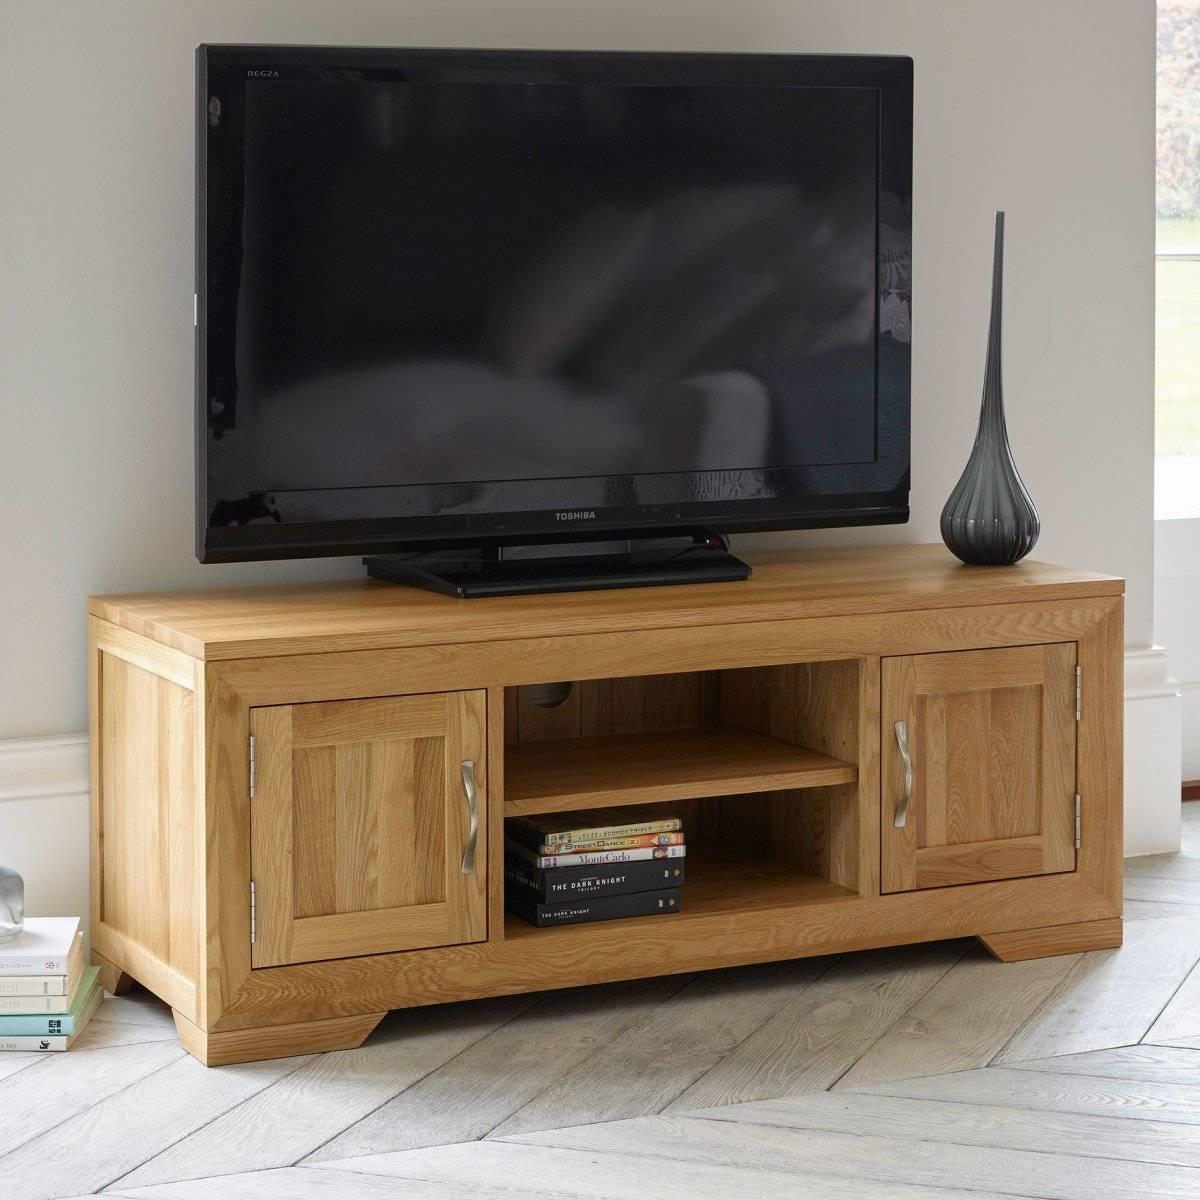 Bevel Natural Solid Oak Widescreen Tv + Dvd Cabinet inside Oak Tv Cabinets For Flat Screens (Image 2 of 15)